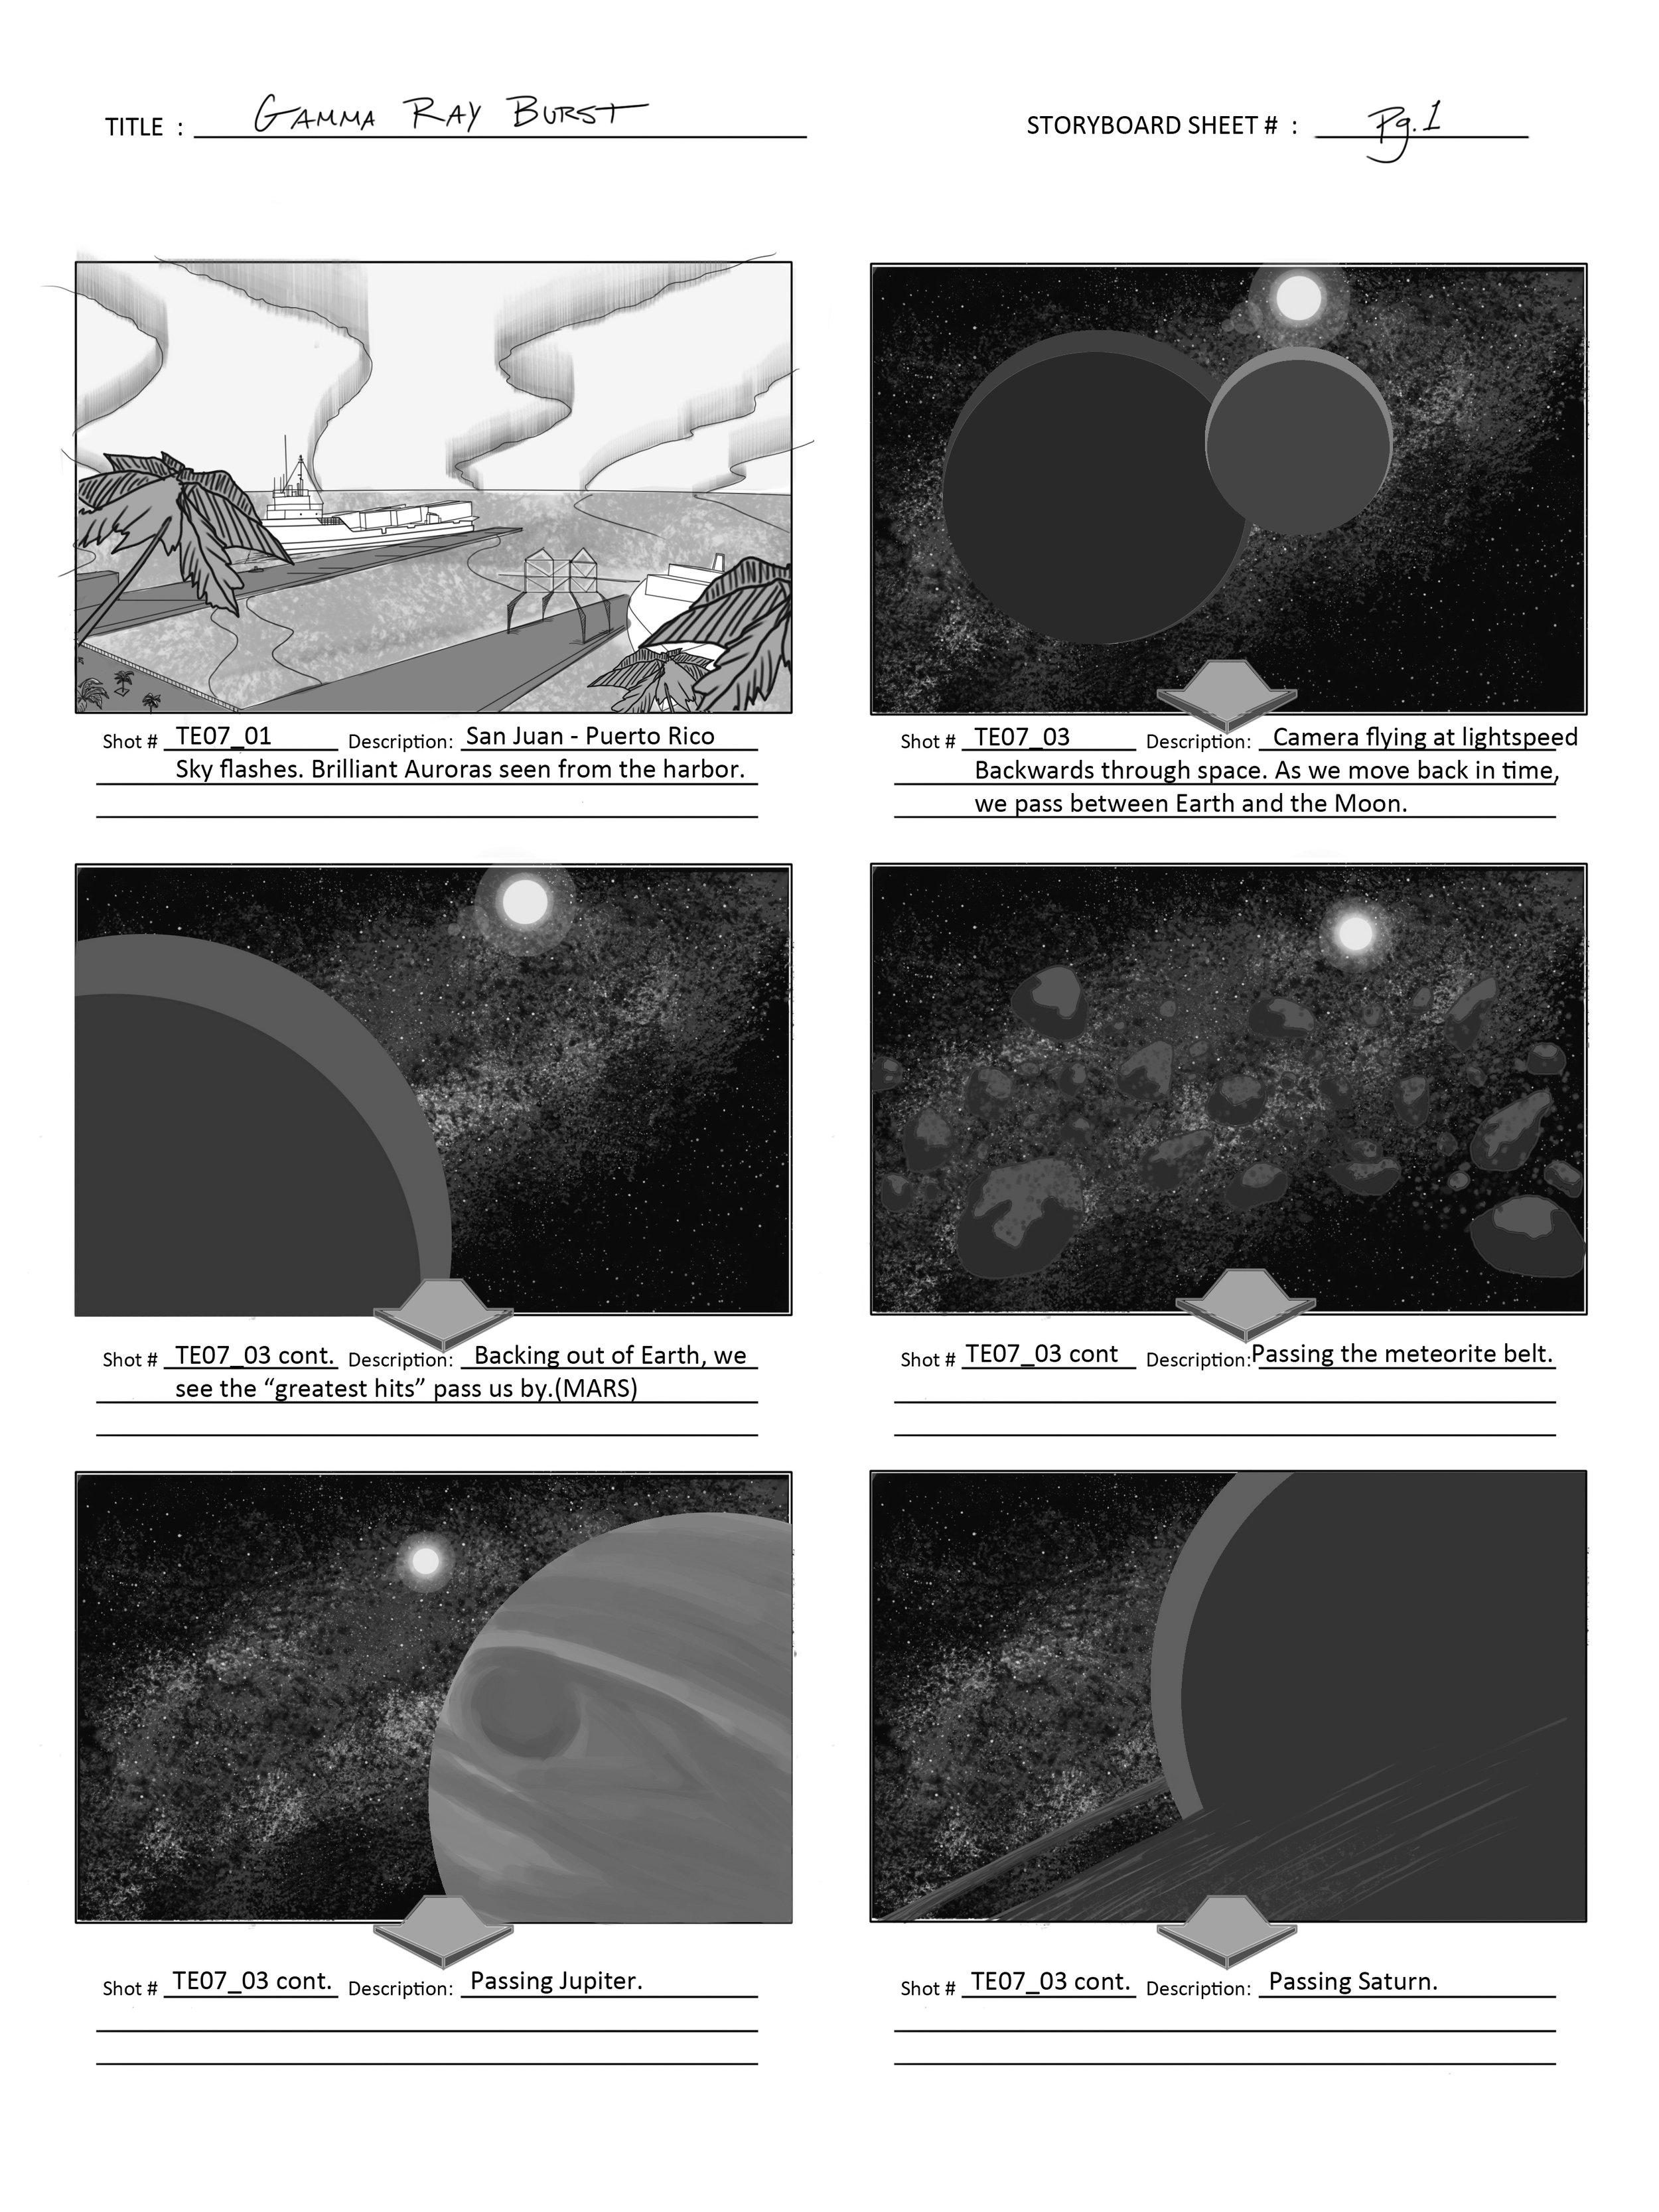 TE07_Gamma Ray Burst_Storyboard Digital Revision pg 01.jpg